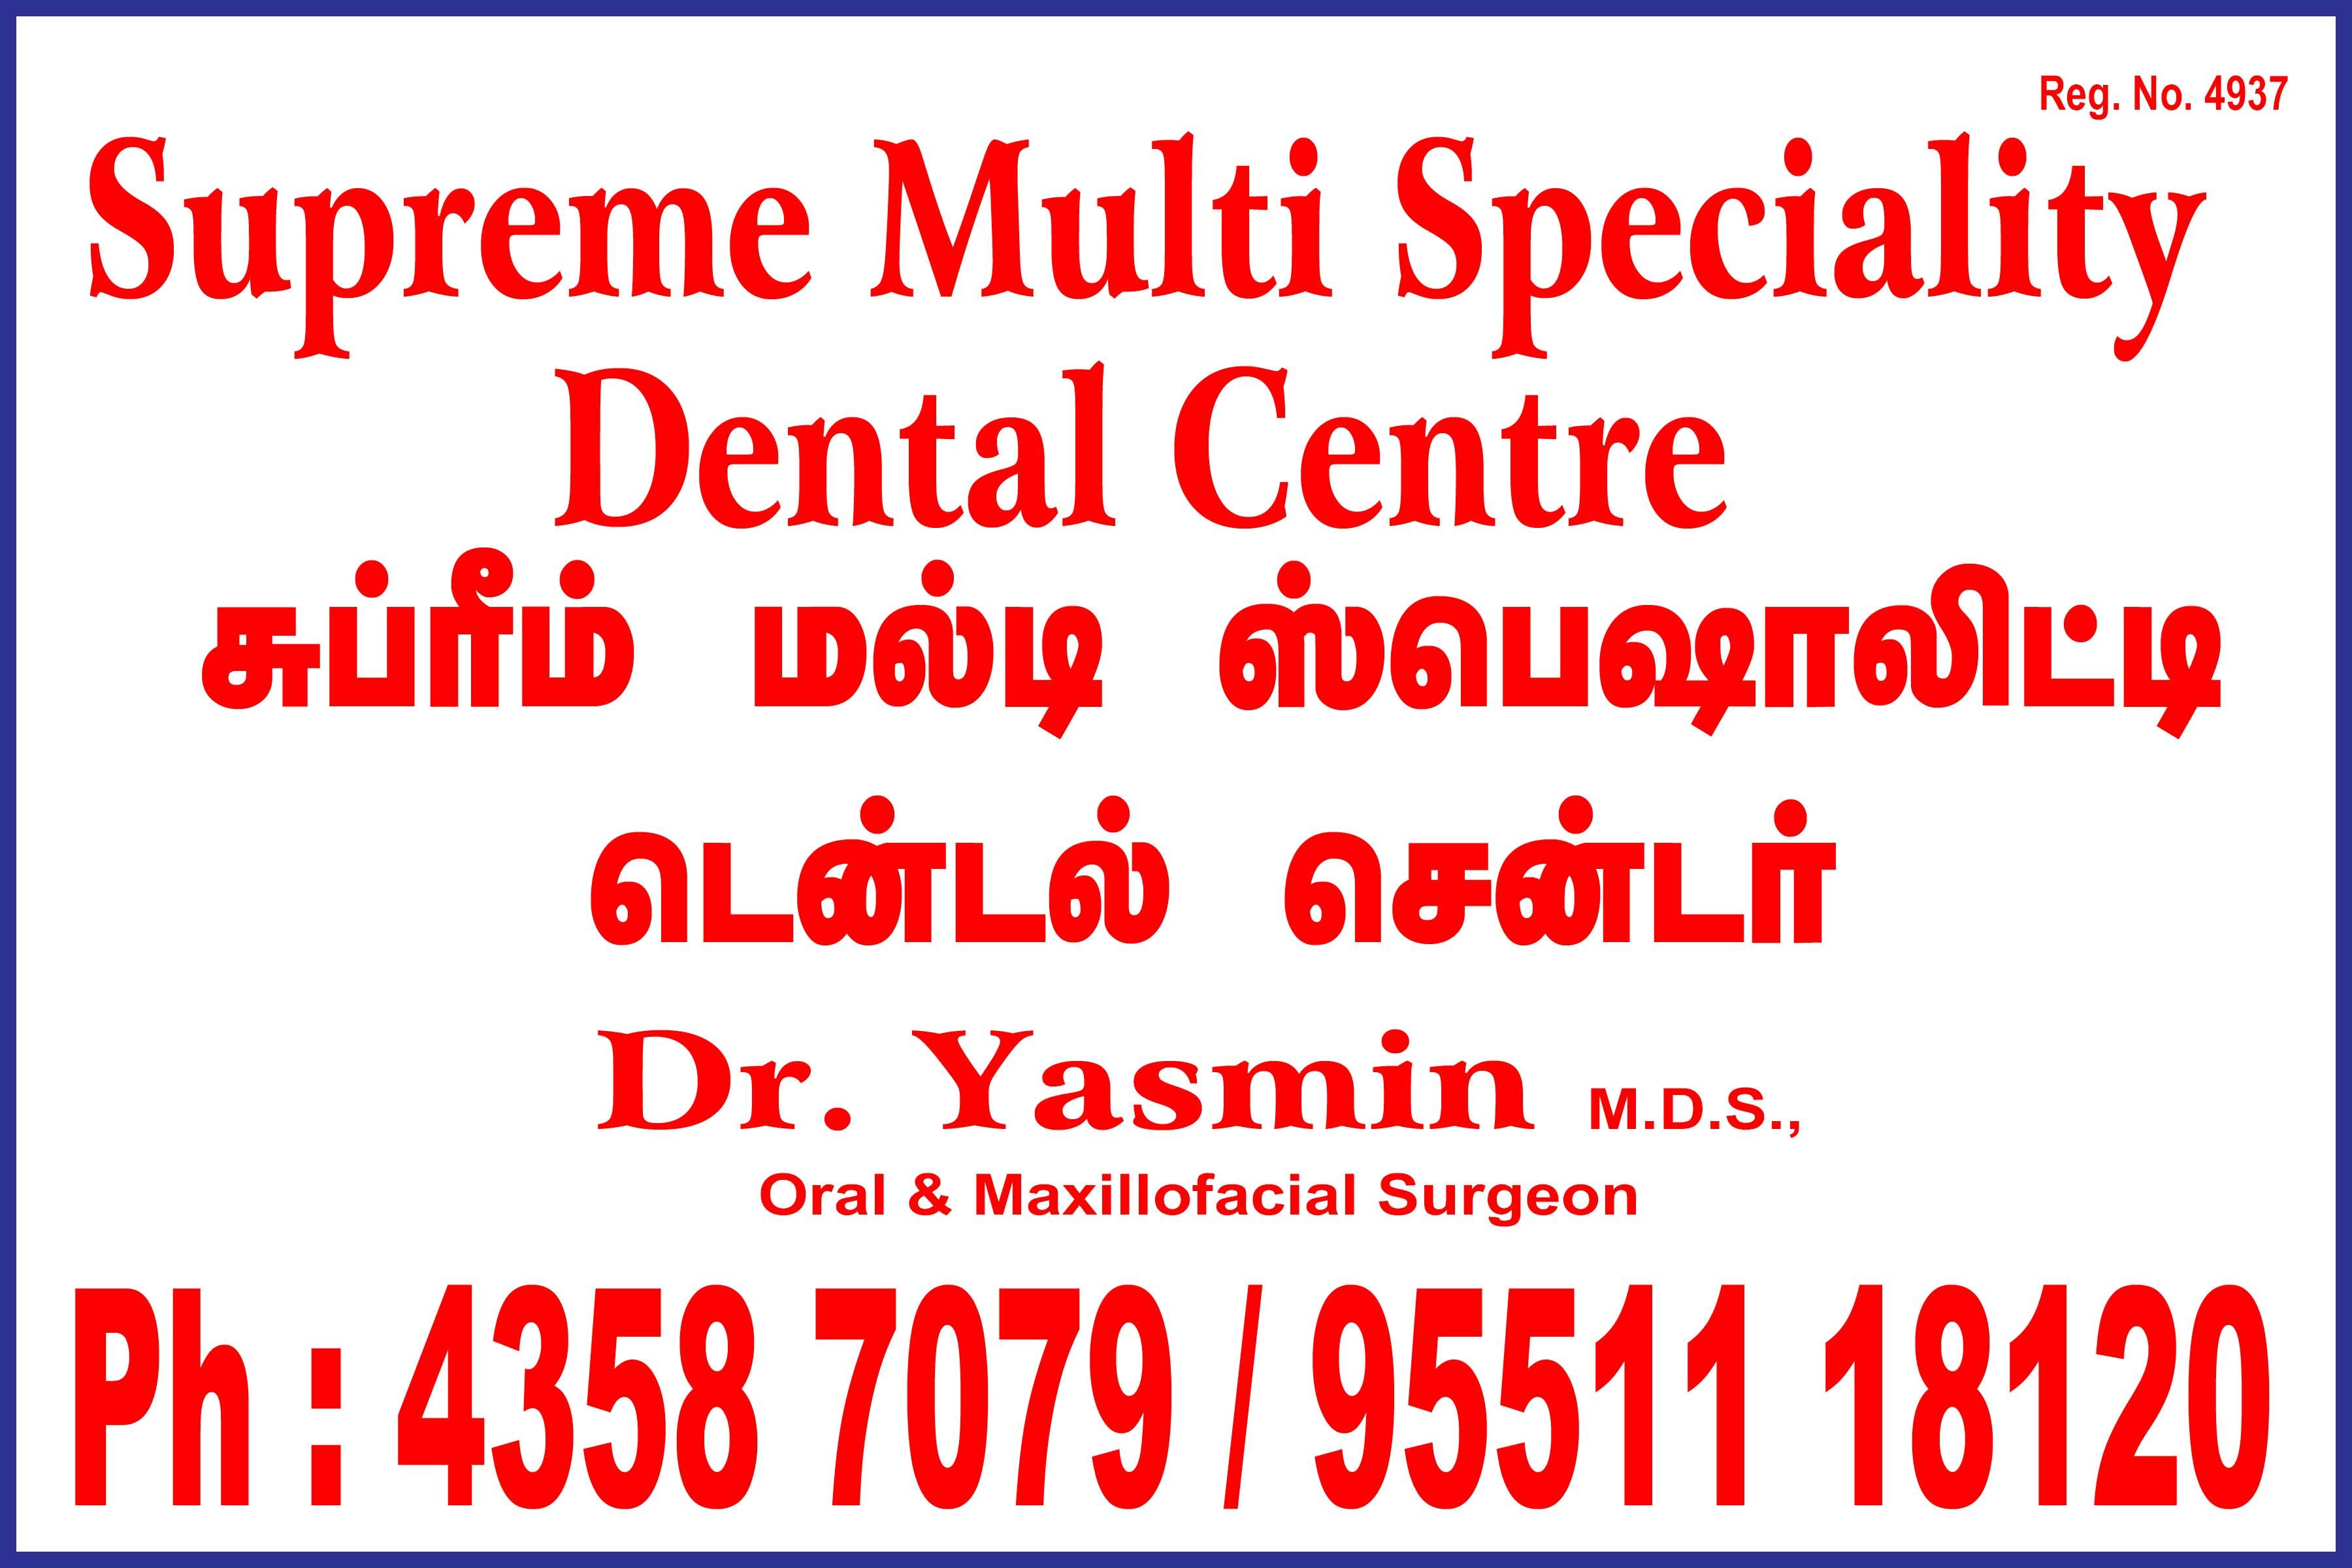 Supreme Multi Speciality Dental Centre | Lybrate.com